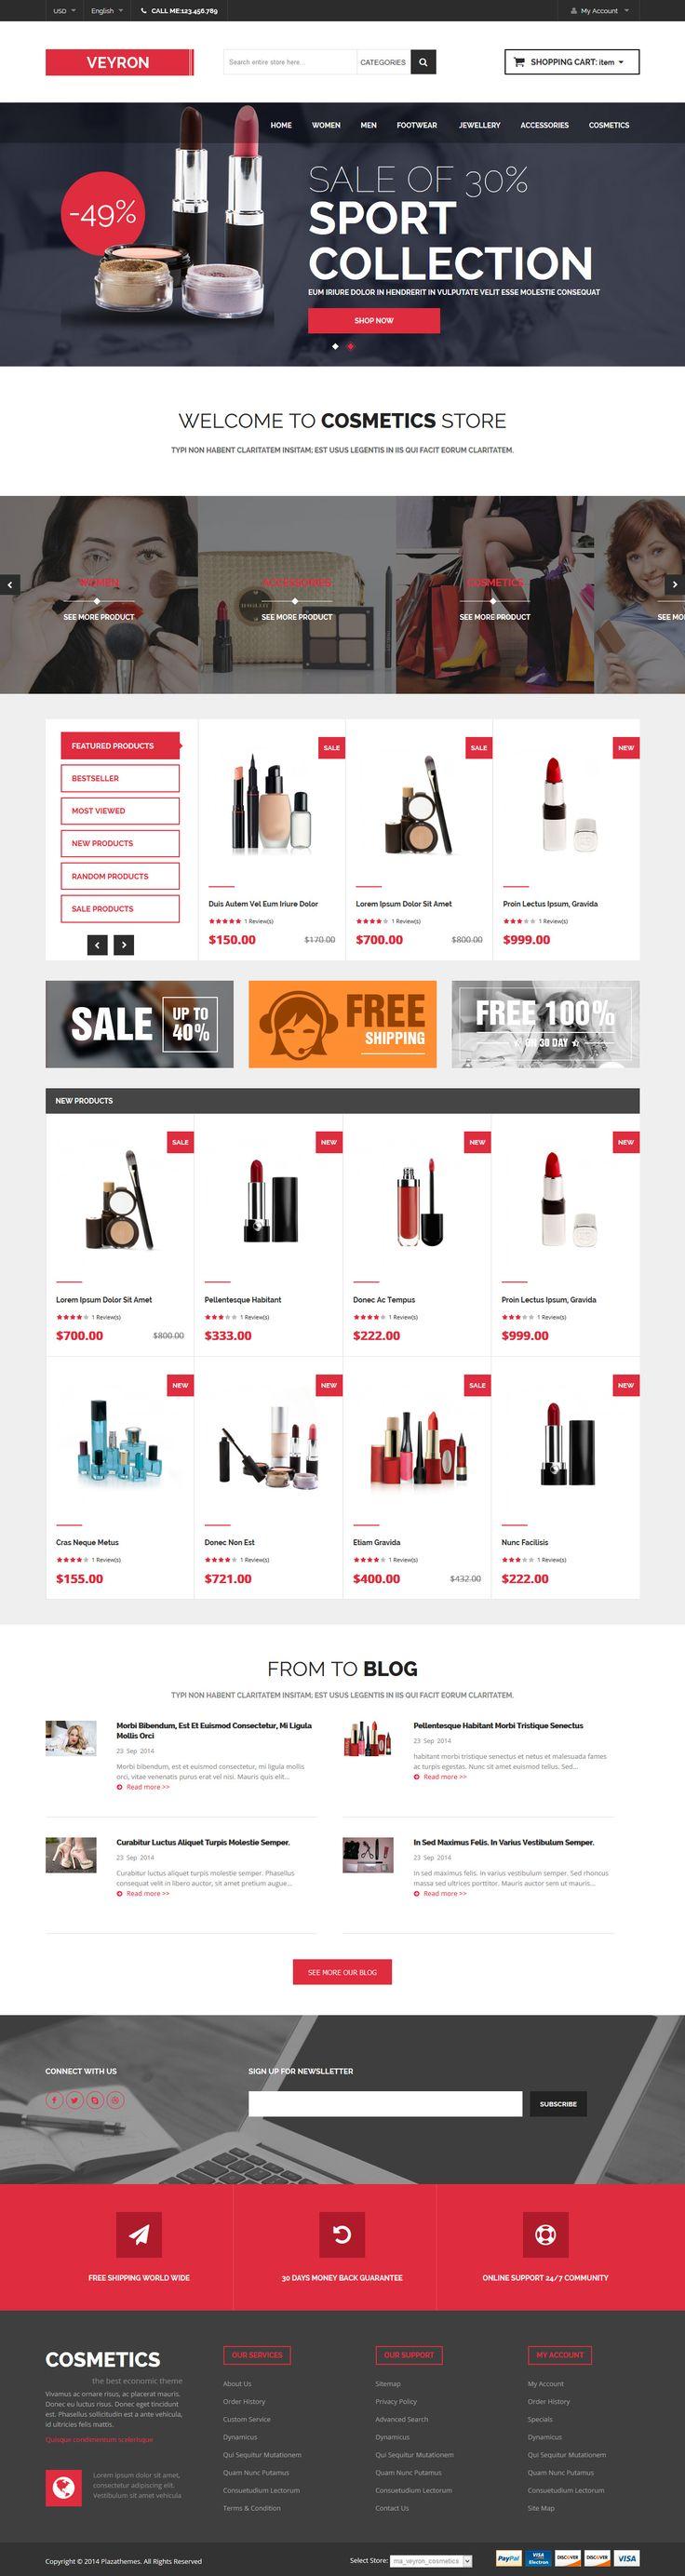 Veyron - Multipurpose Responsive Magento Theme #website #webshop #ecommerce Download: http://themeforest.net/item/veyron-multipurpose-responsive-magento-theme/9117158?ref=ksioks